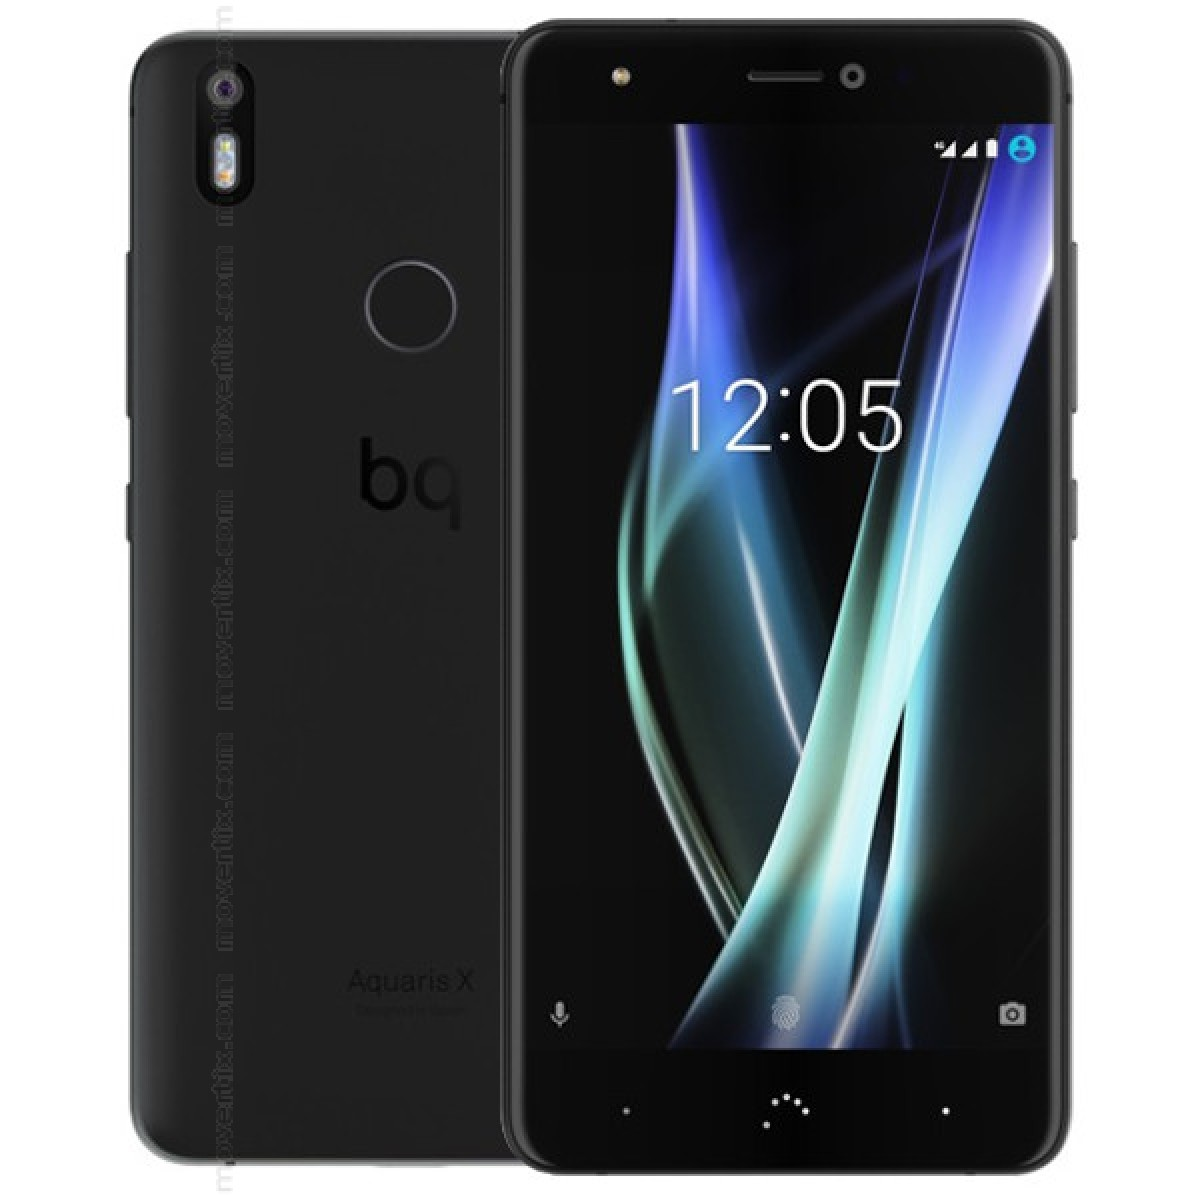 Bq Aquaris X Black 32GB and 3GB RAM (8435439882484 ...